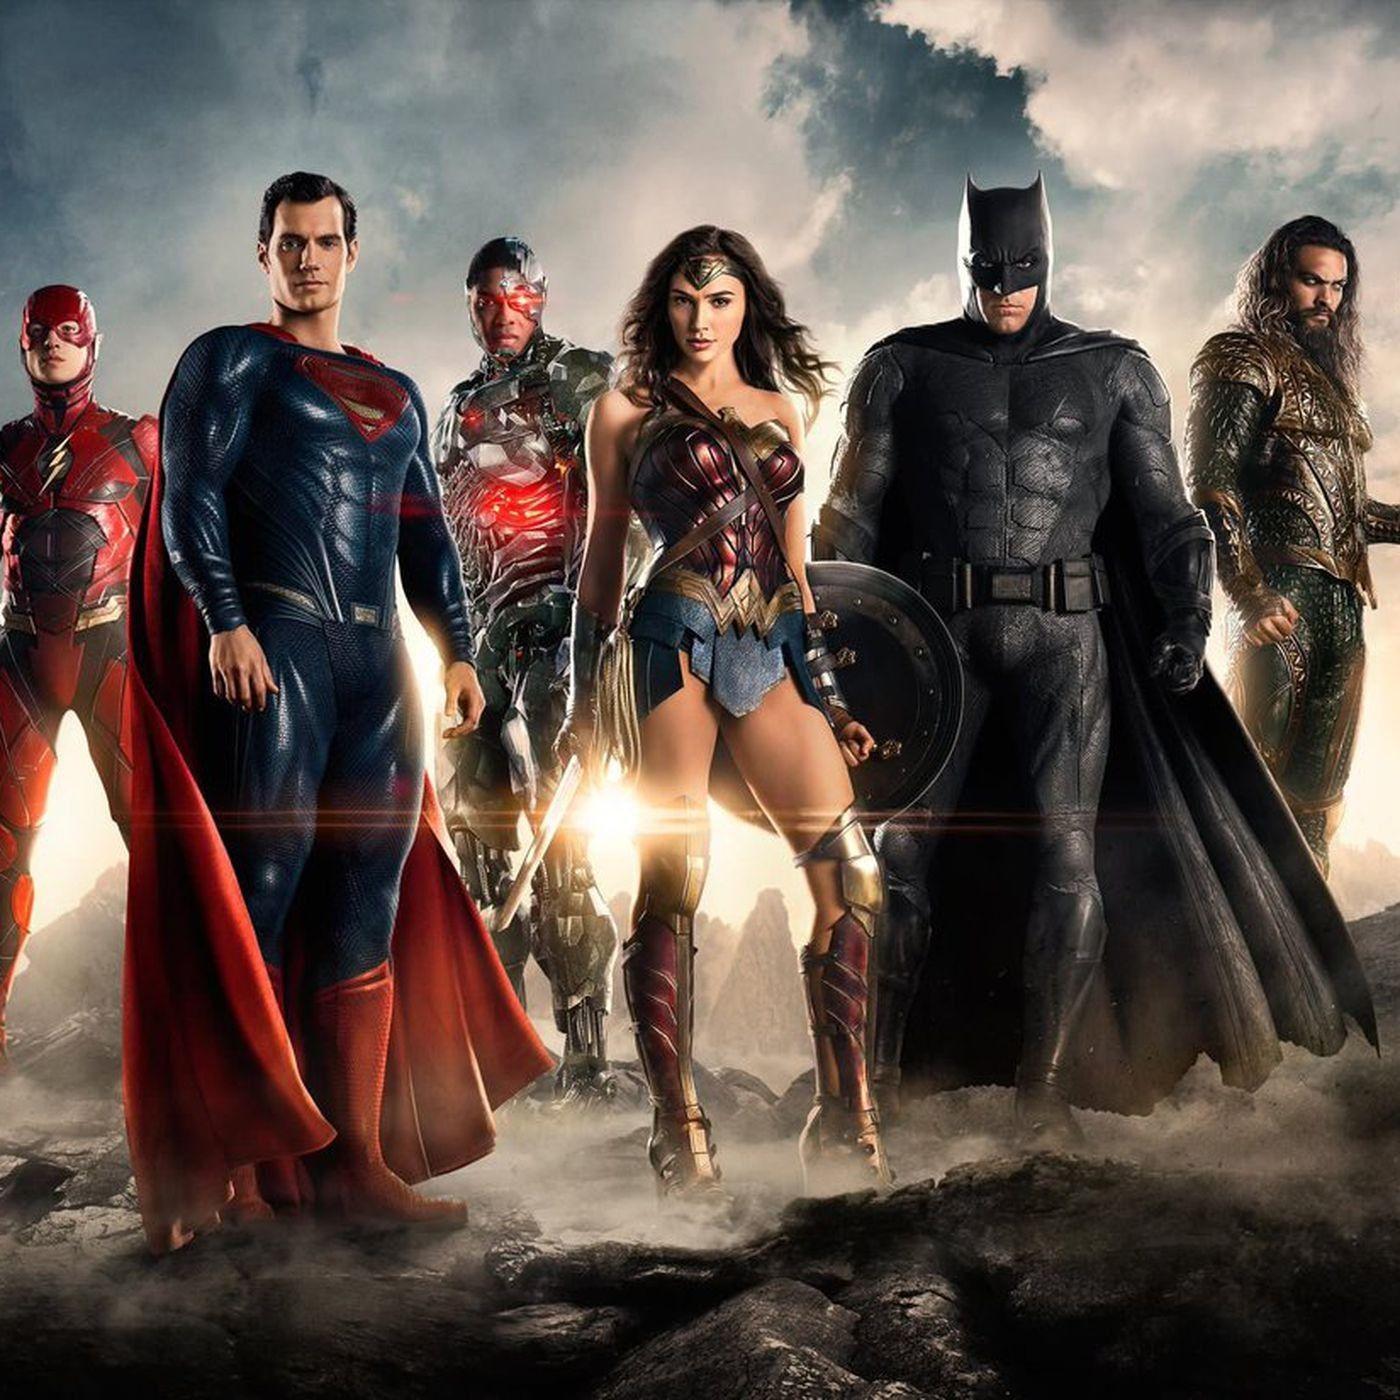 Luxury Justice League Wallpapers For Mobile Film Superhero Bioskop Justice League